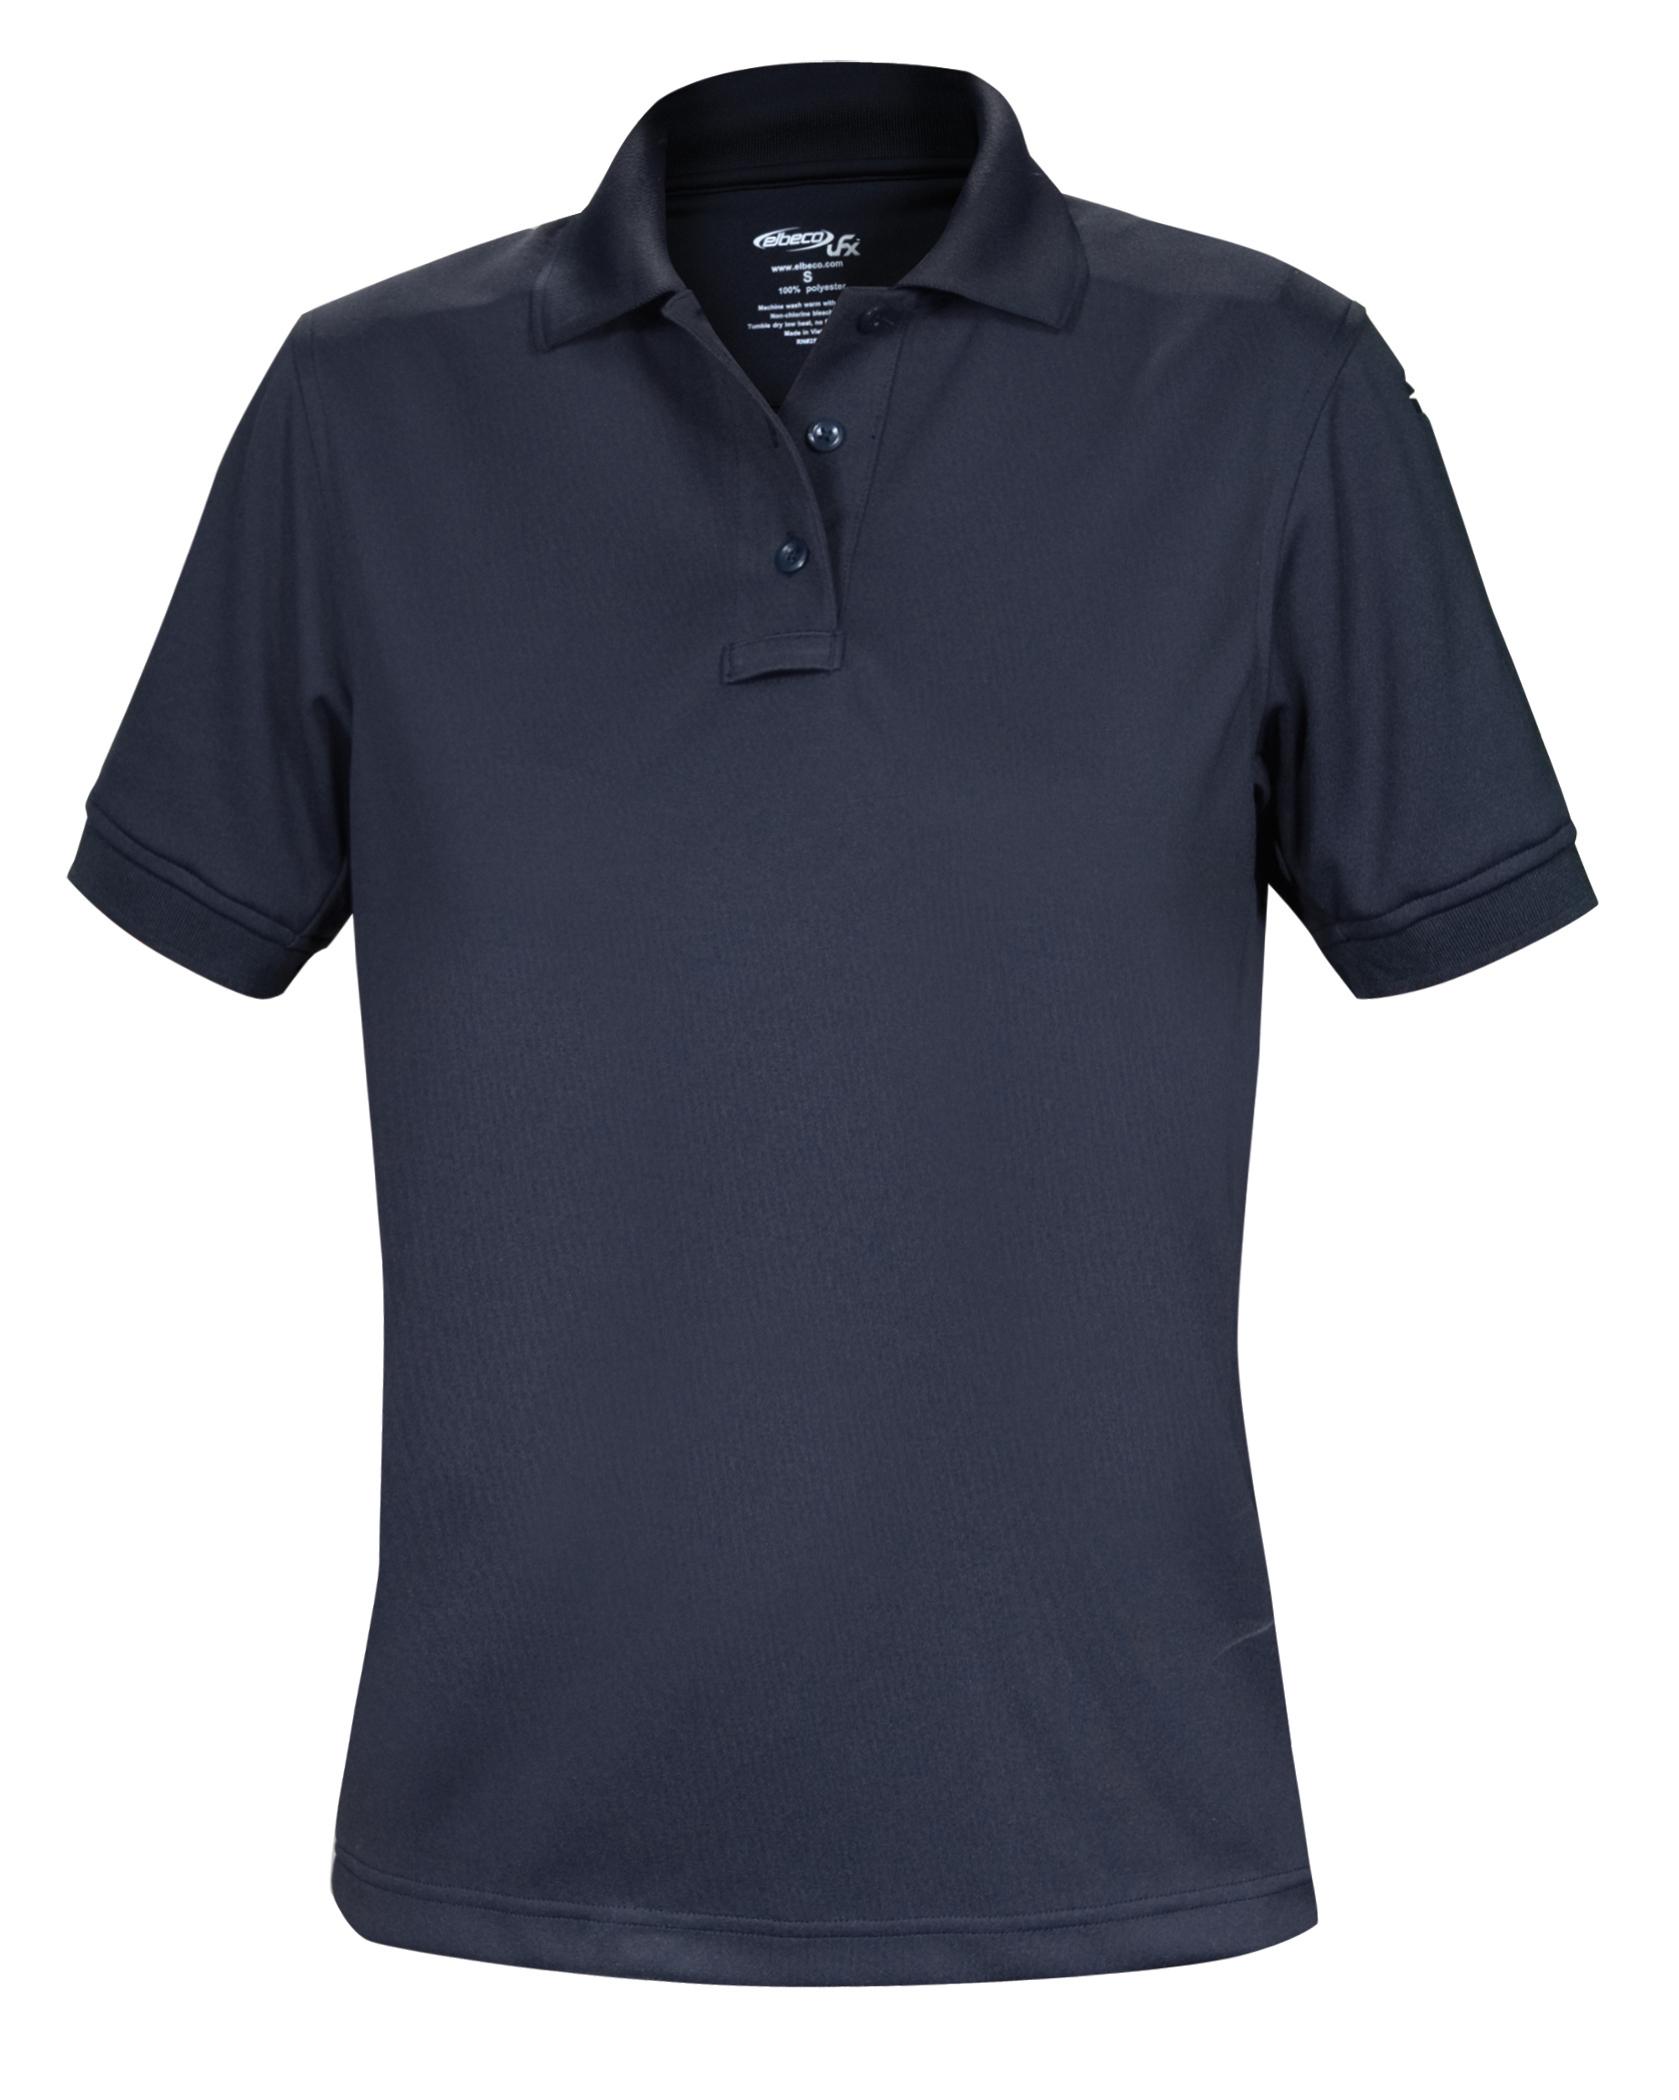 9192b1a46 Elbeco Women's Short Sleeve Ladies Cut UFX Tactical Polo Shirt: Midnight  Navy 2XLarge